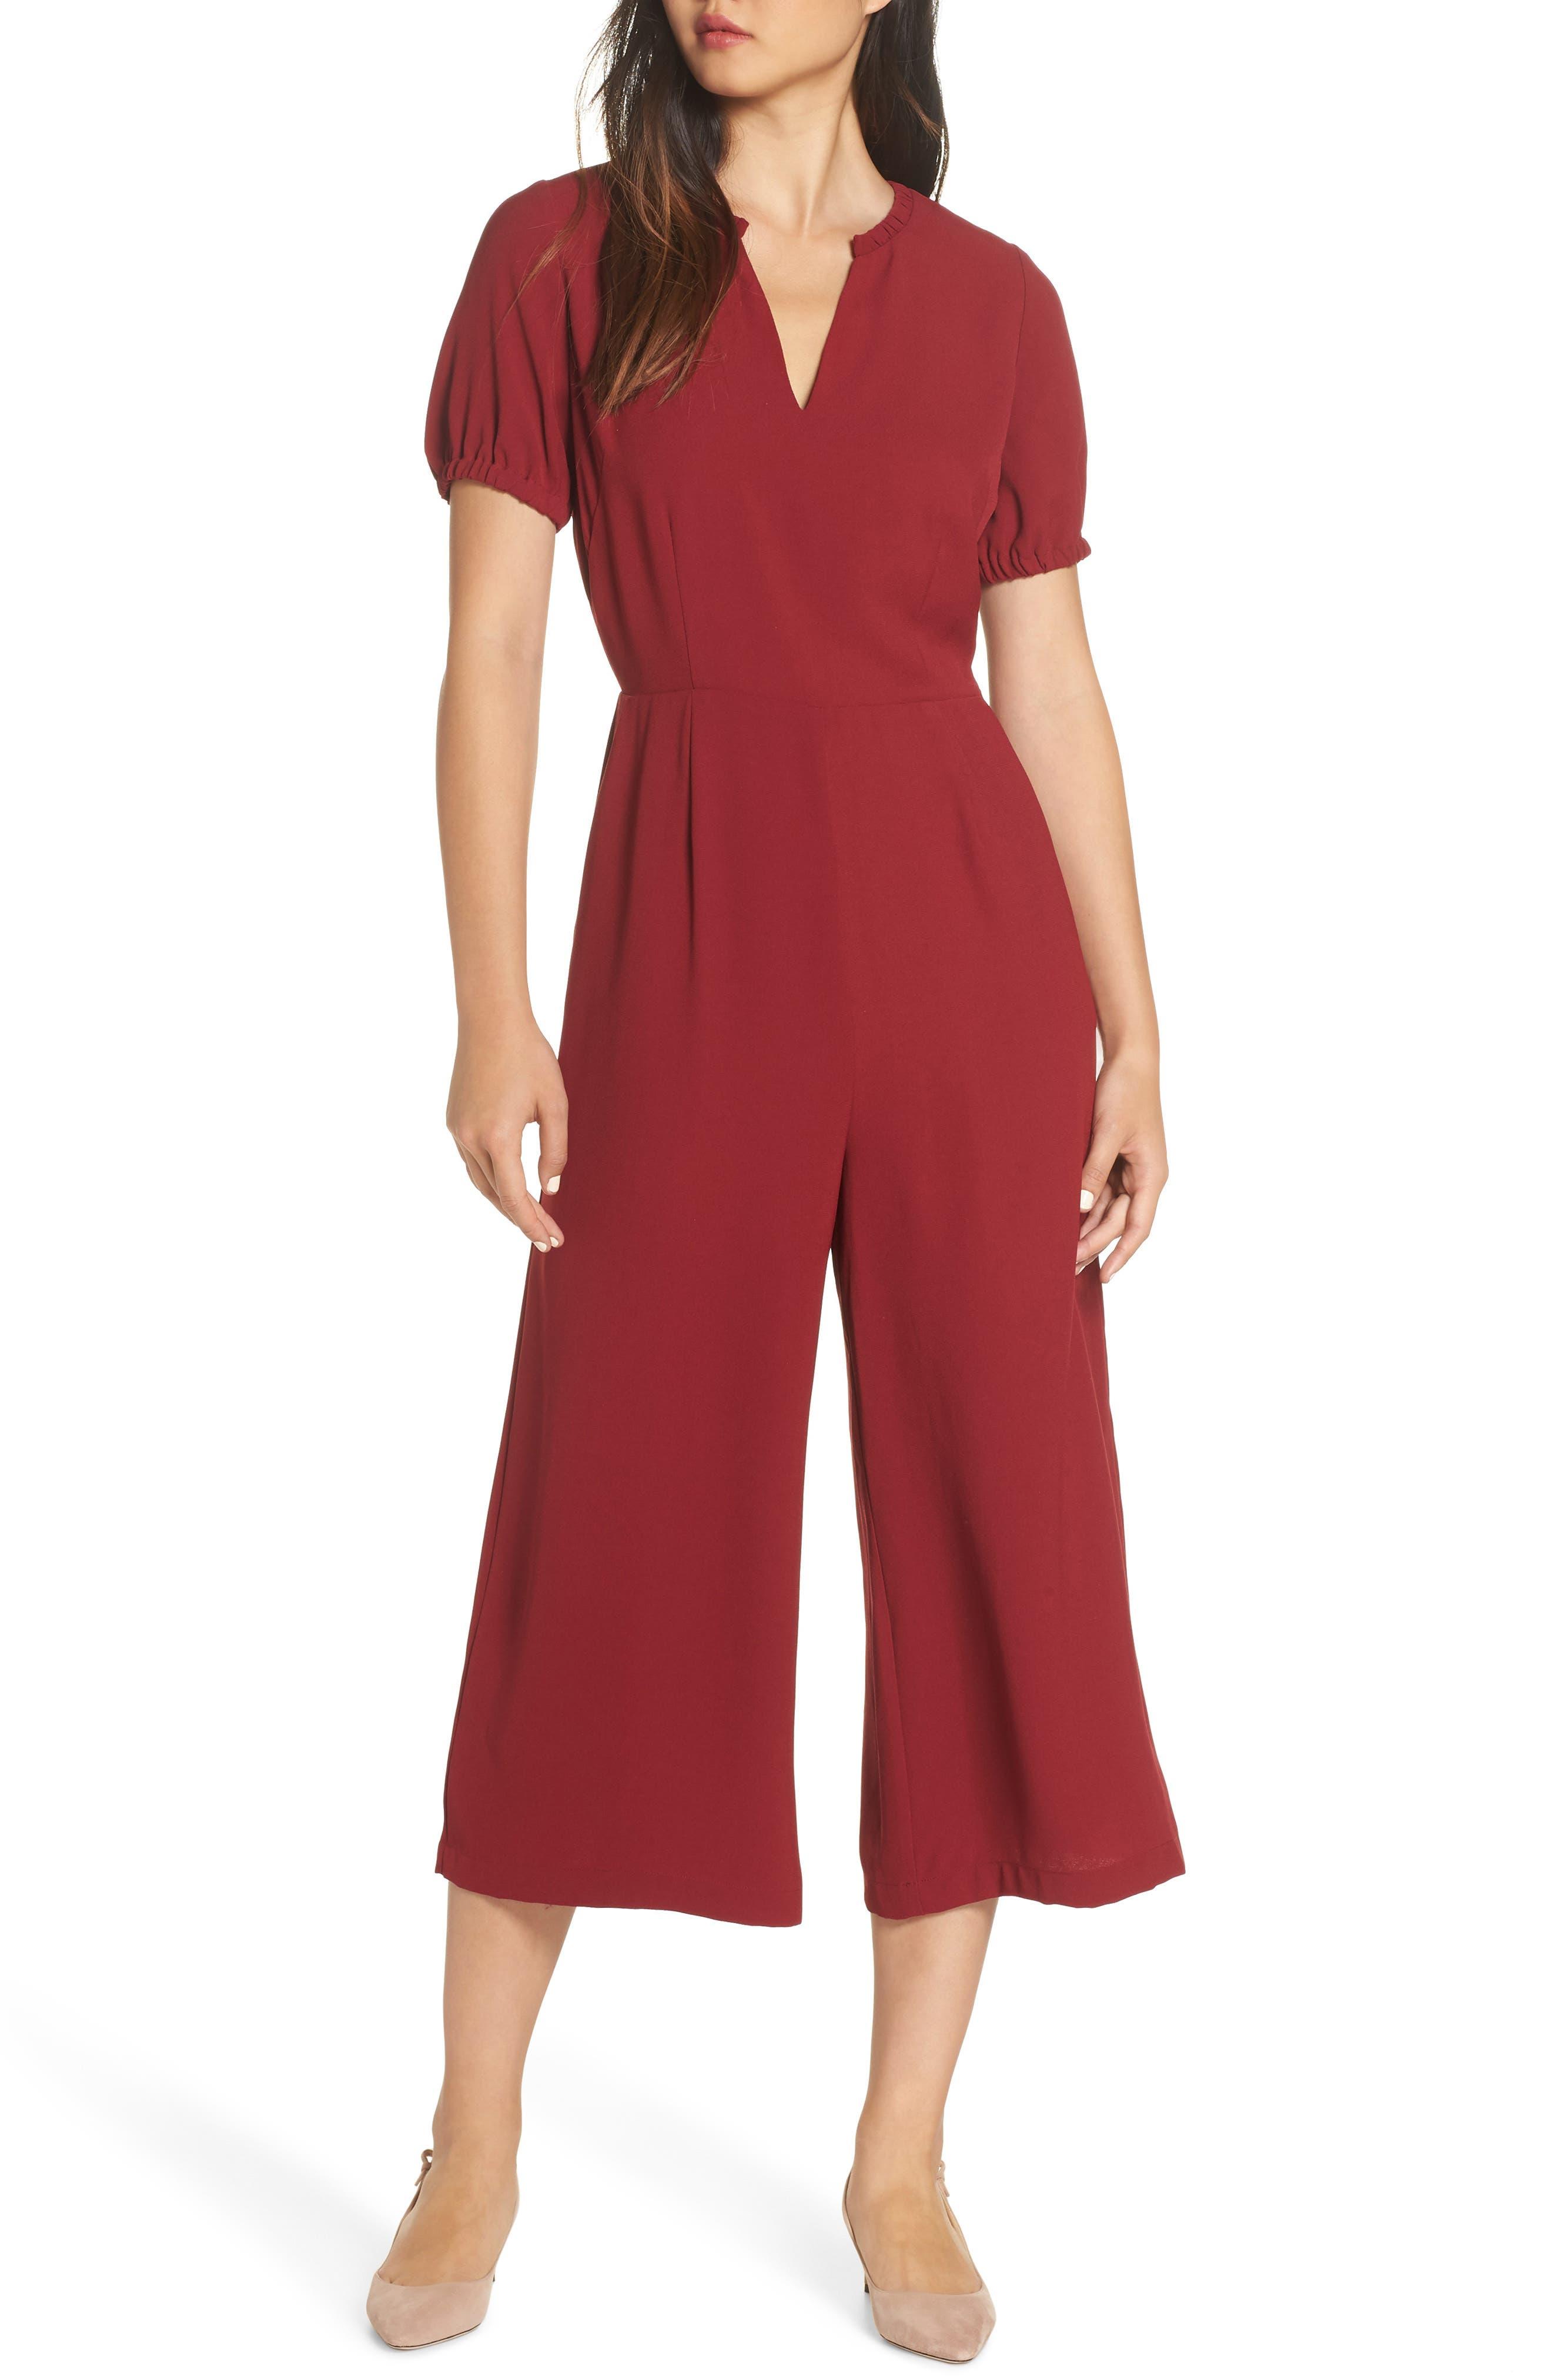 19 COOPER Crop Jumpsuit in Red